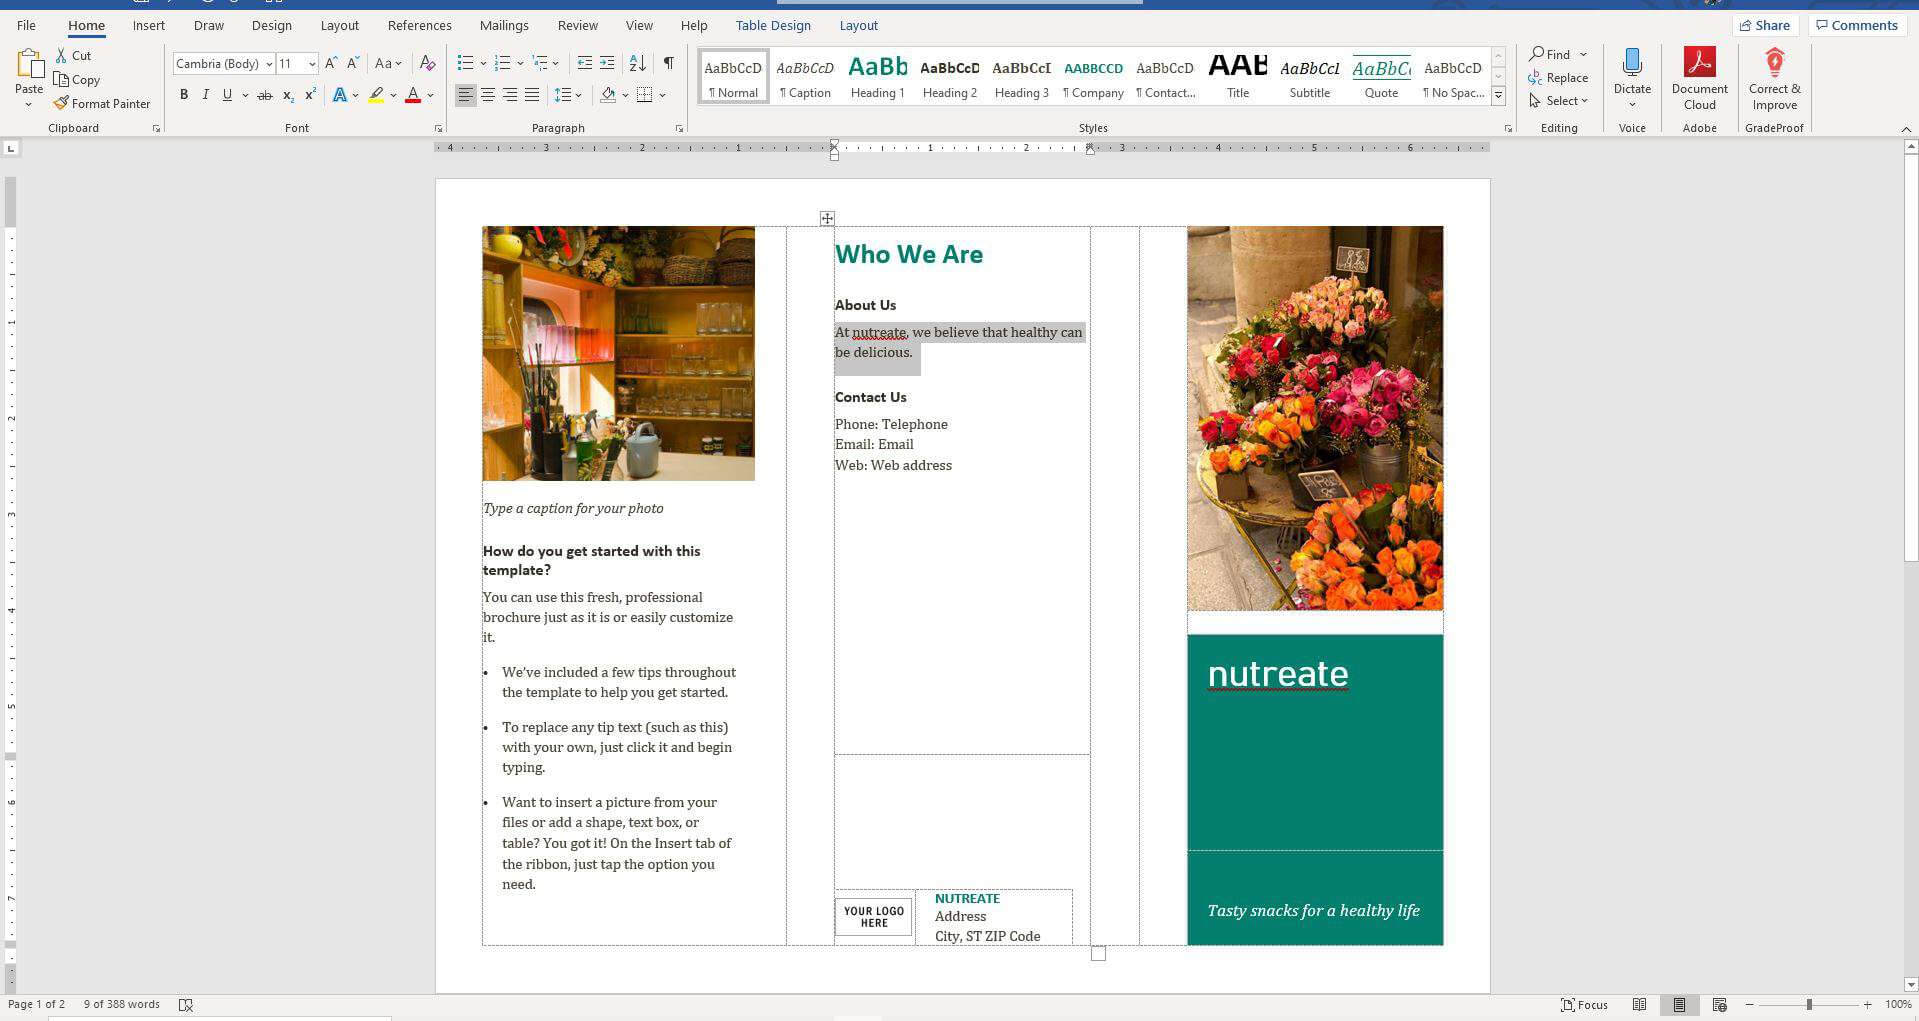 011 Microsoft Office Brochure Templates Template Ideas For Brochure Templates For Word 2007